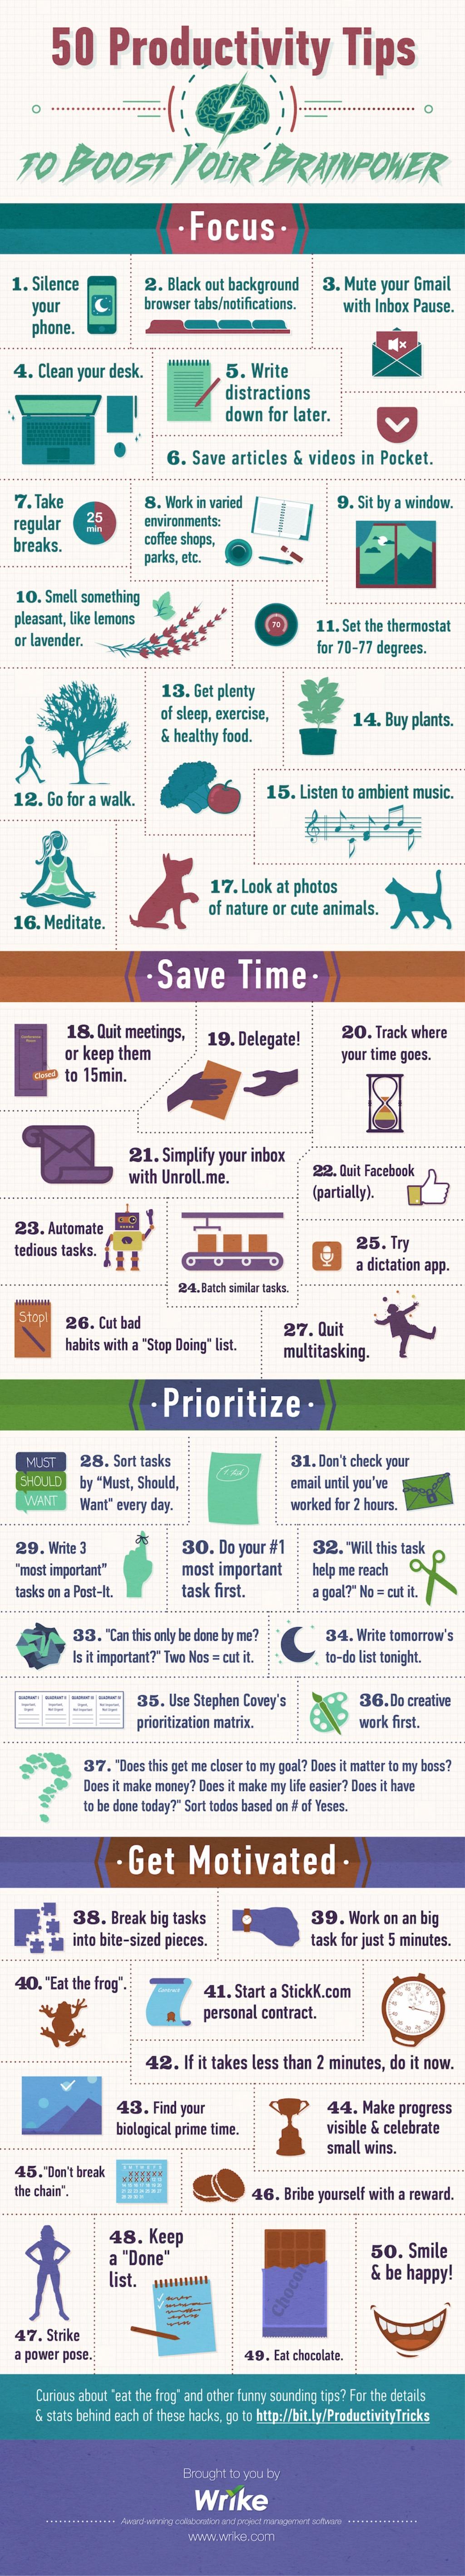 50-productivity-tips-brainpower-infographic